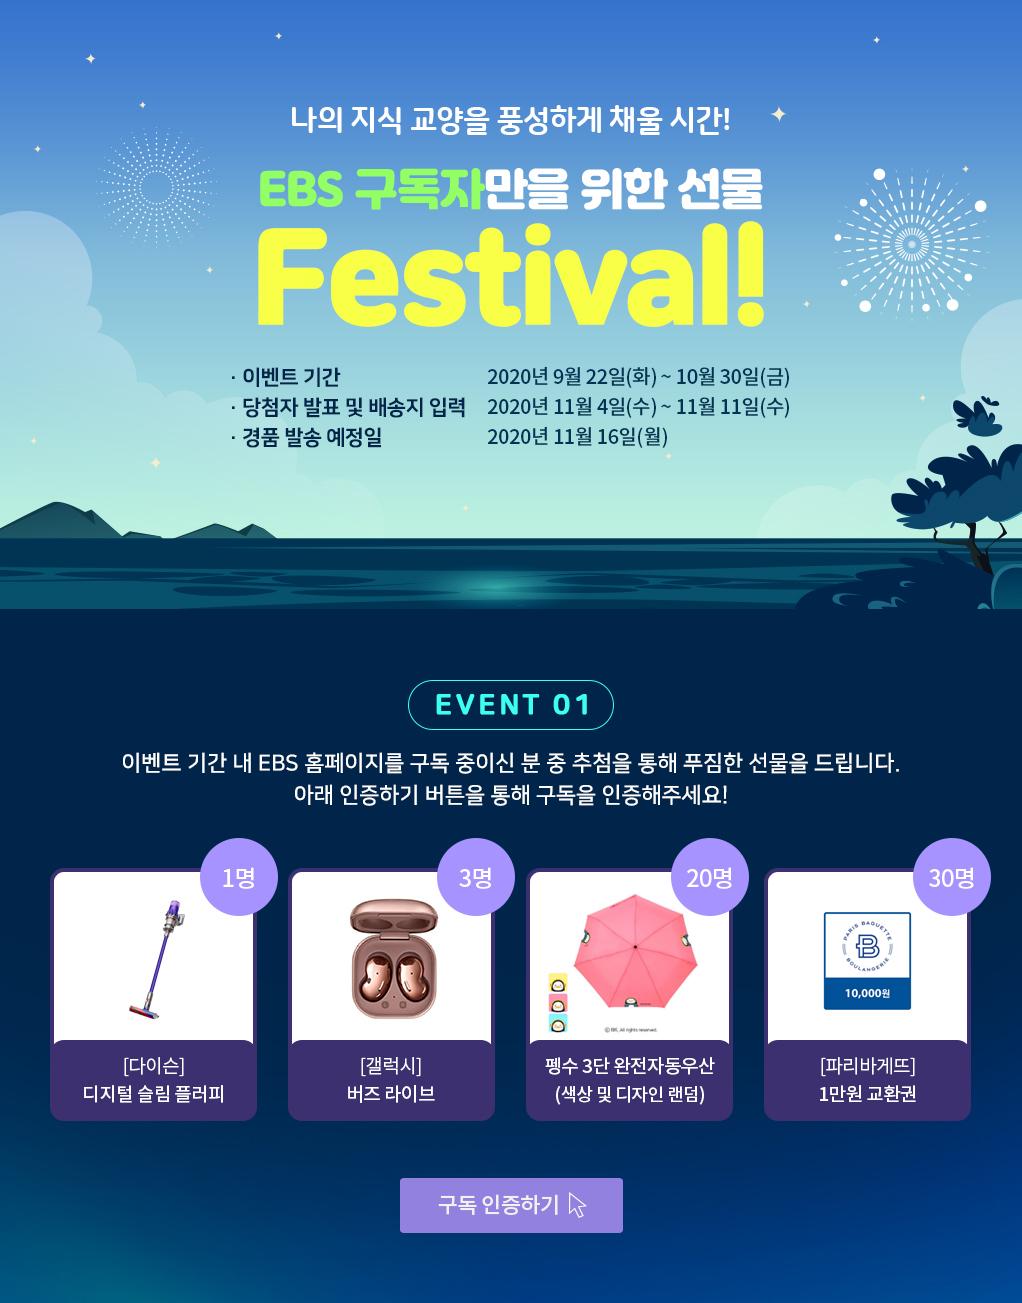 EBS 구독자만을 위한 선물 Festival